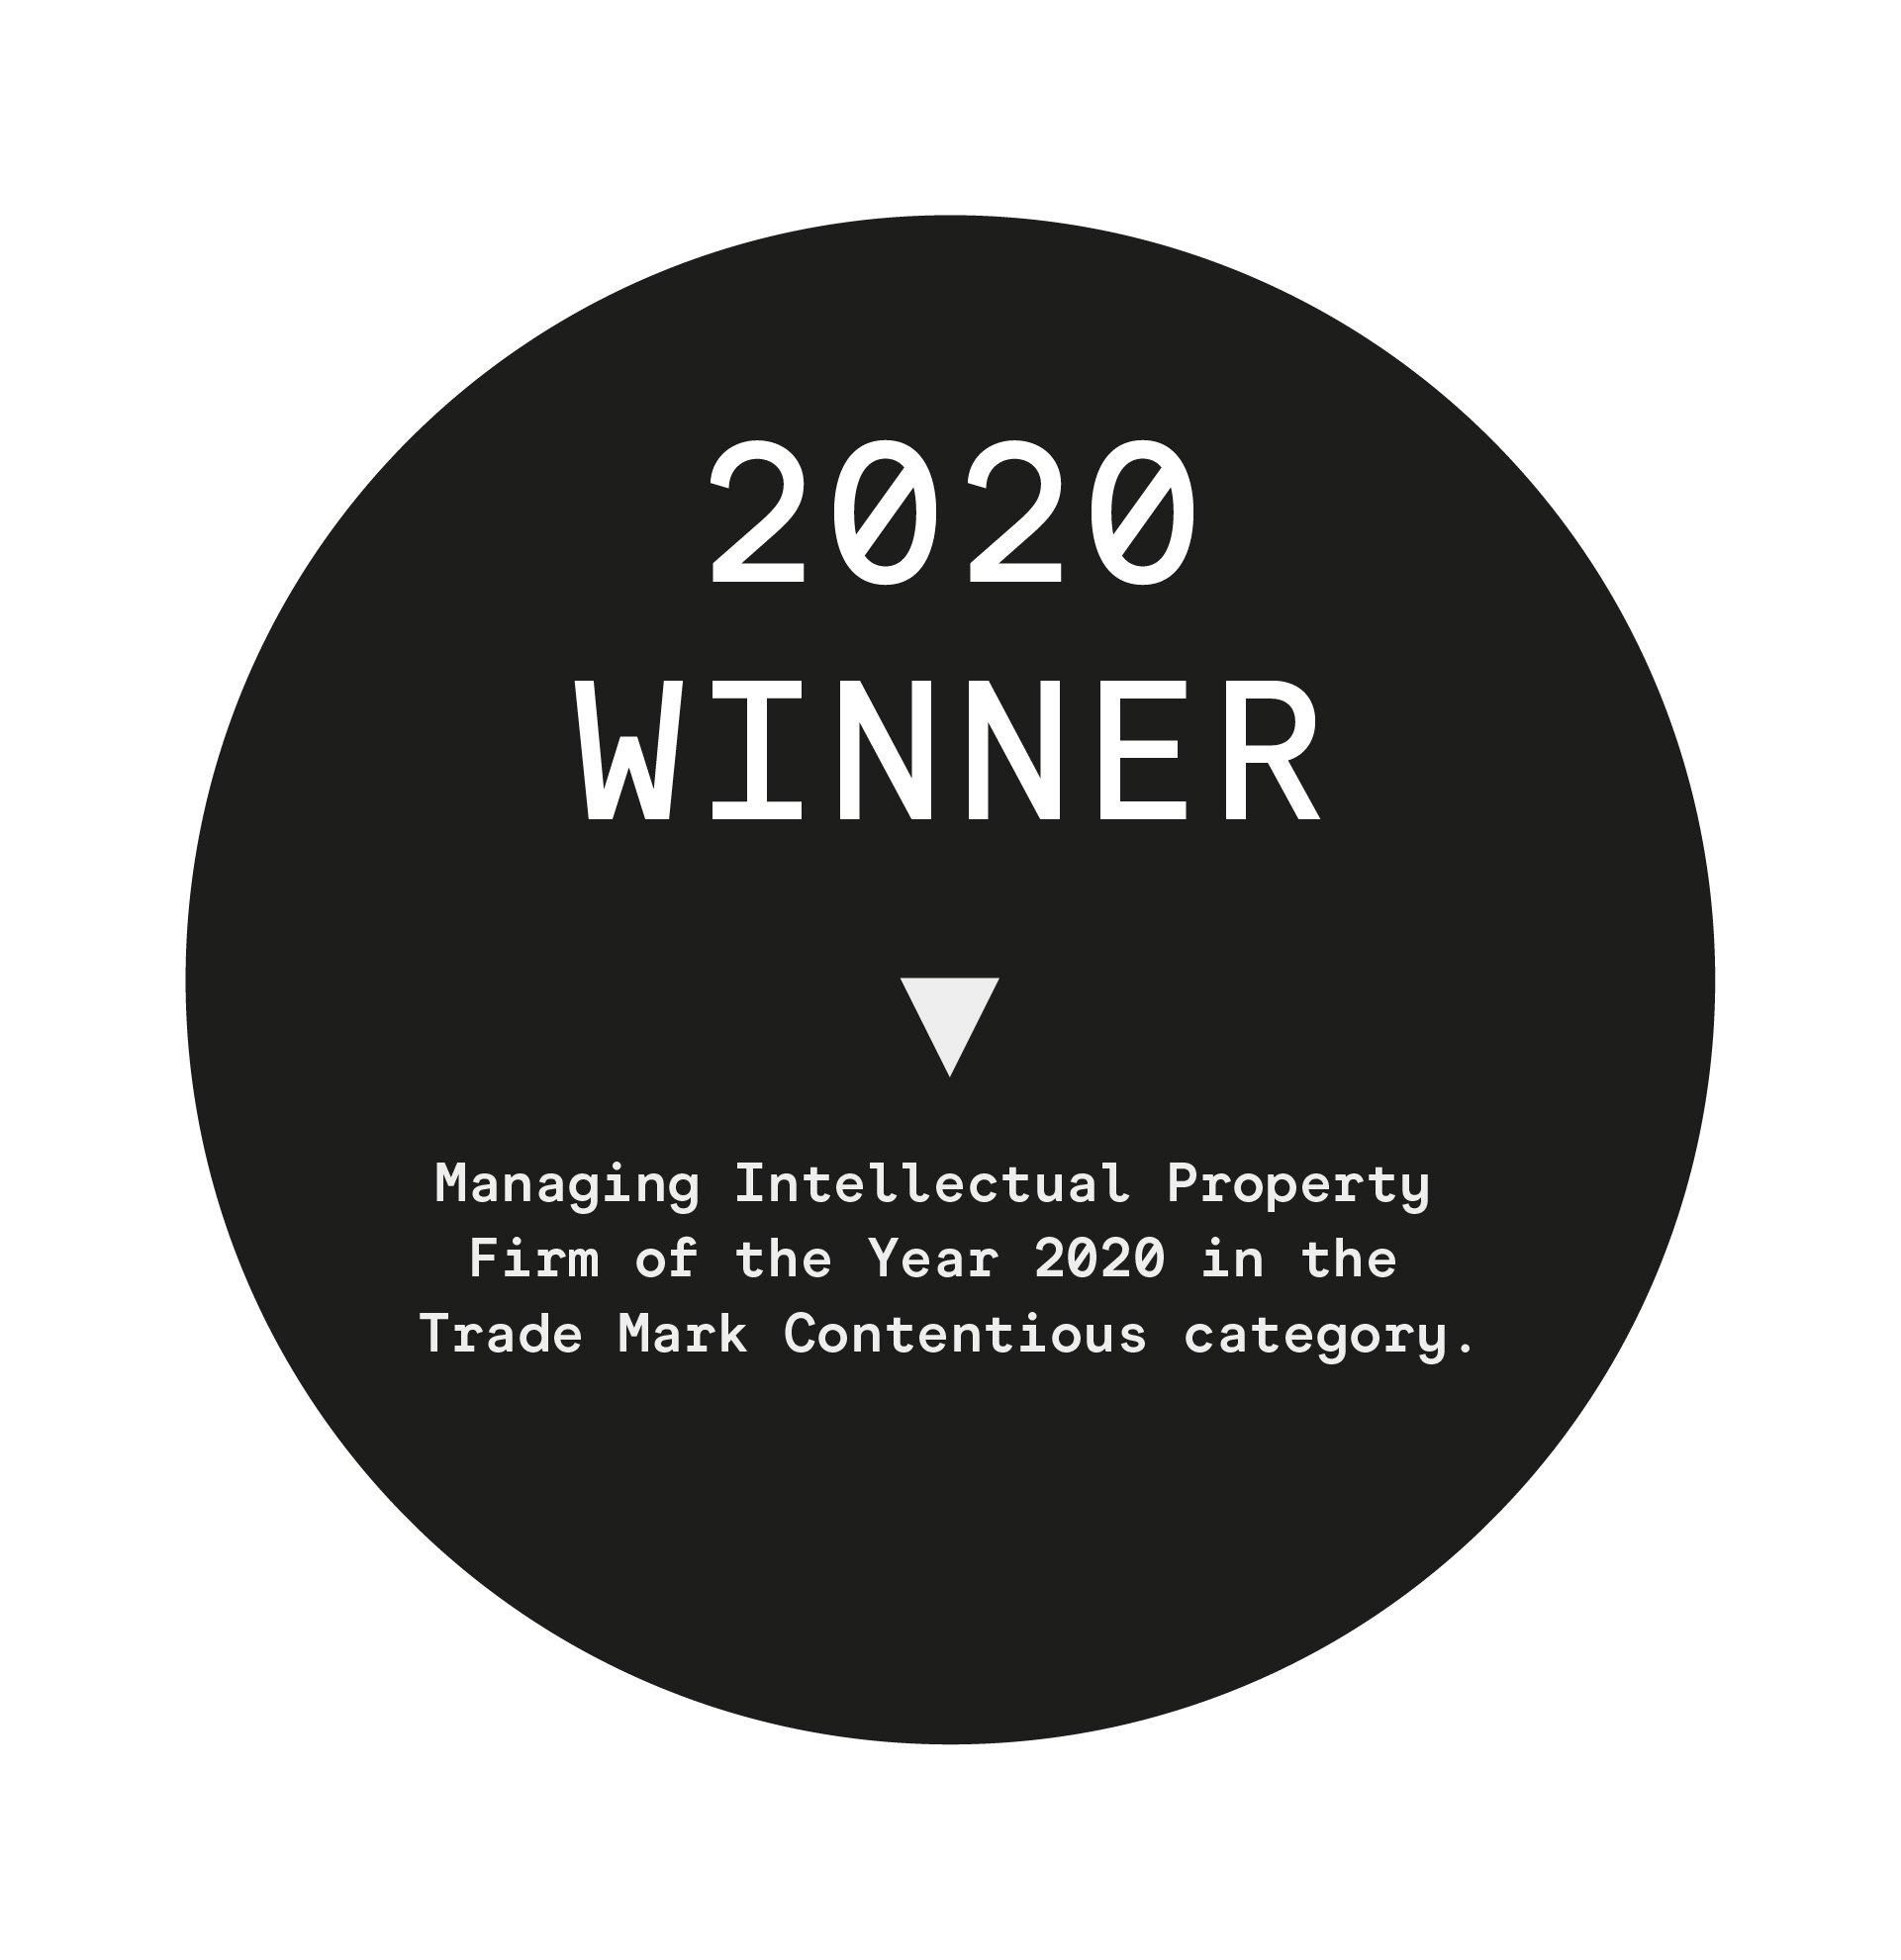 Stobbs 2020 Award White Background